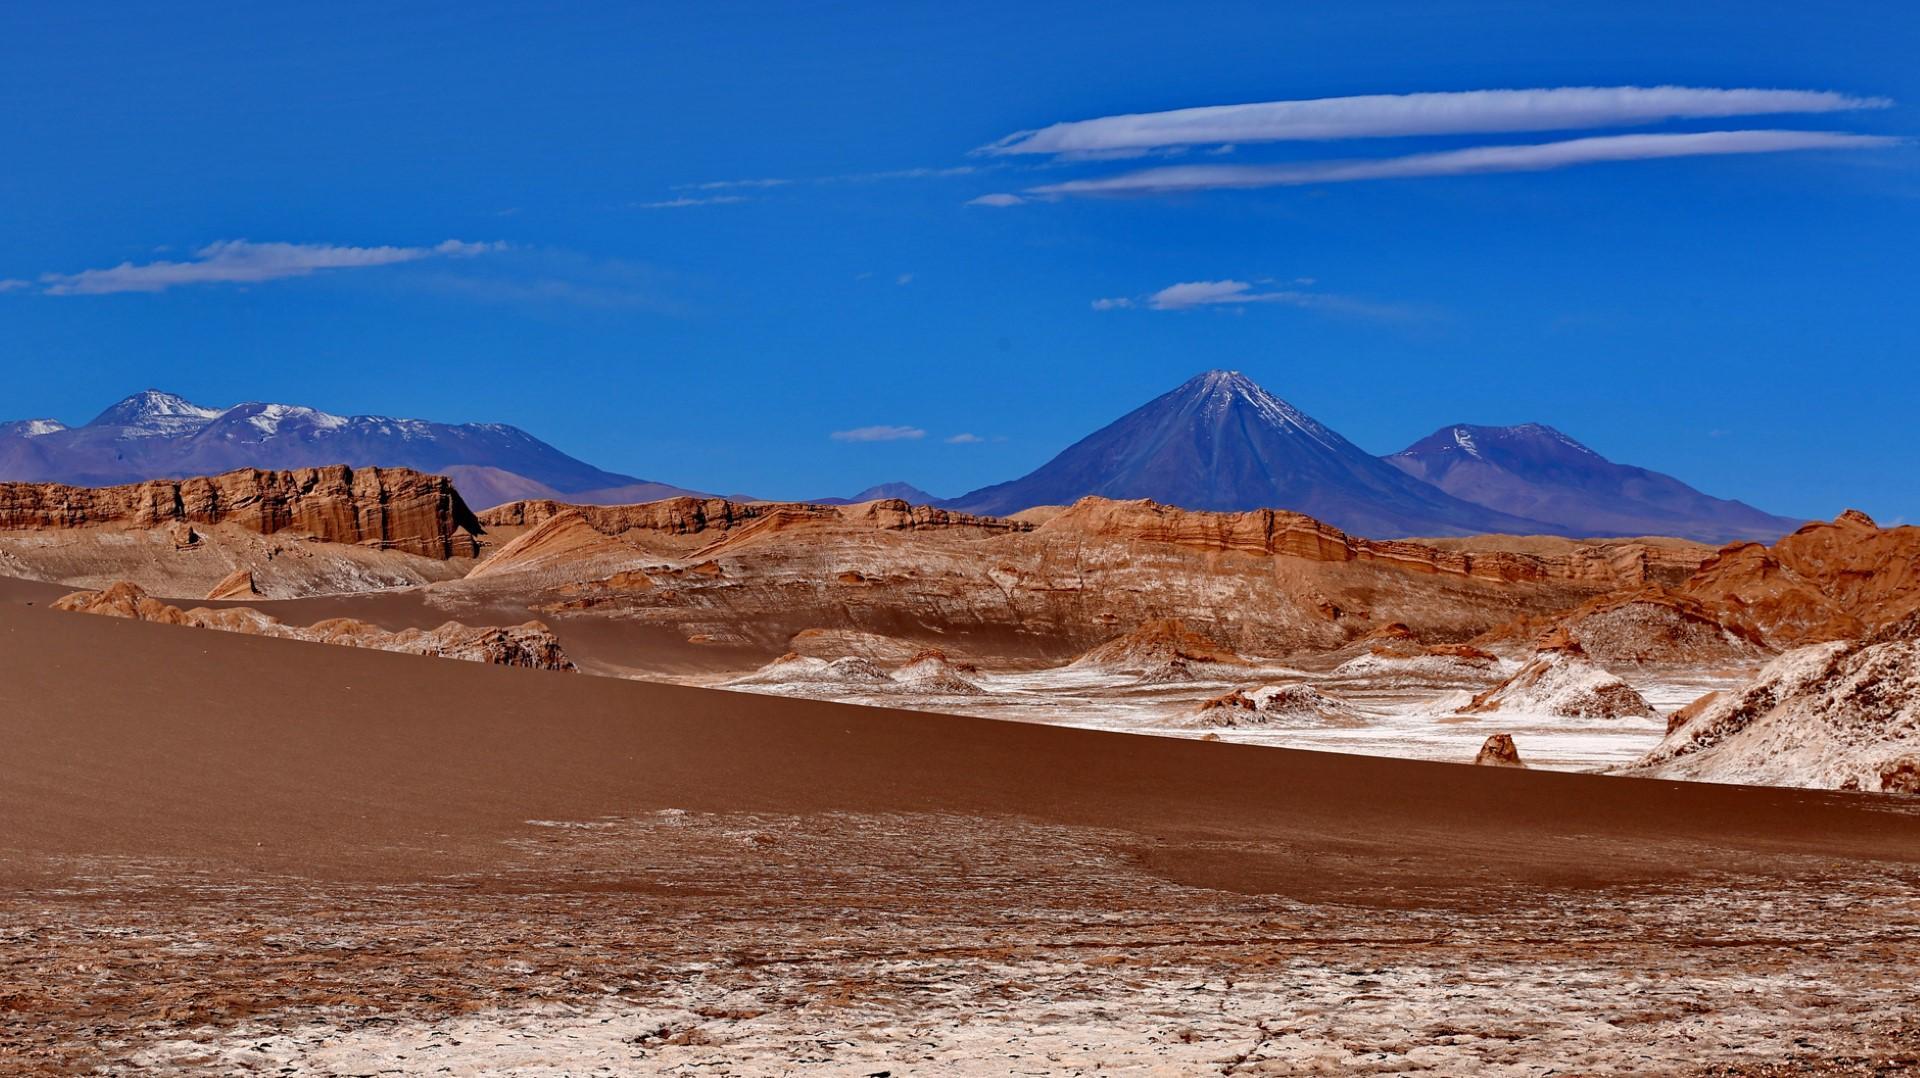 Donnavventura nel deserto di Atacama